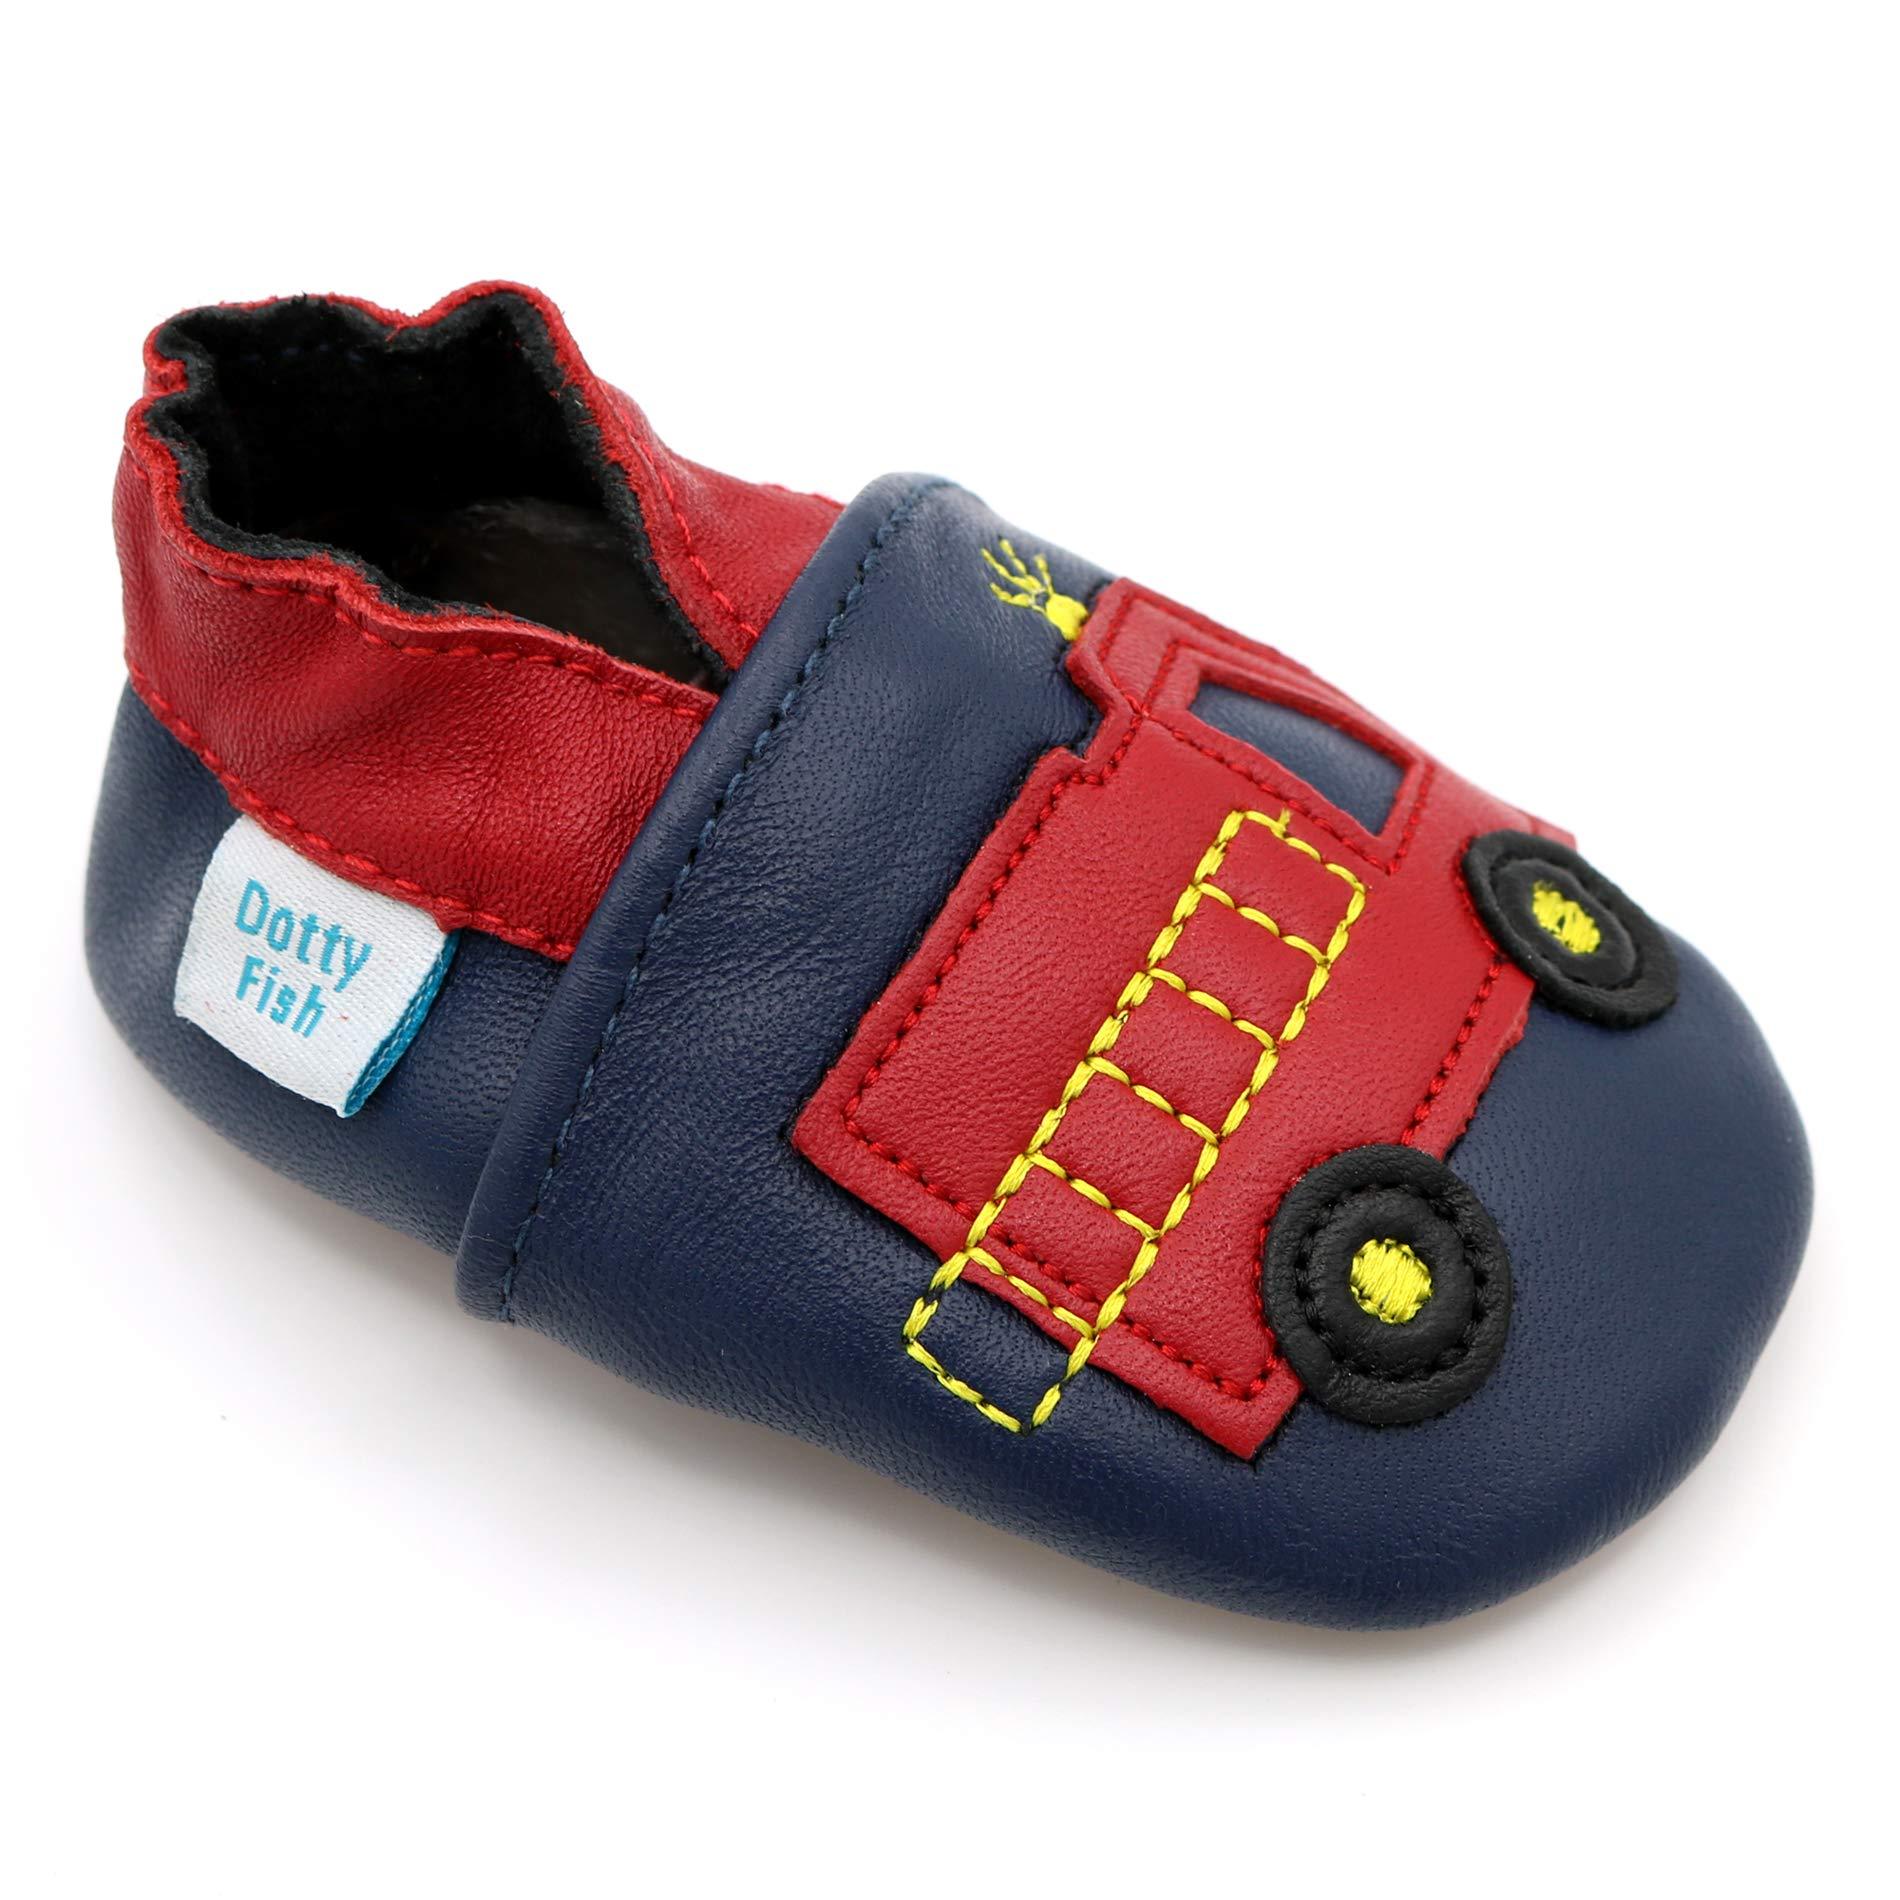 half off f92a3 0db3d Dotty Fish Chaussures Cuir Souple bébé et Bambin. 0-6 Mois - 4-